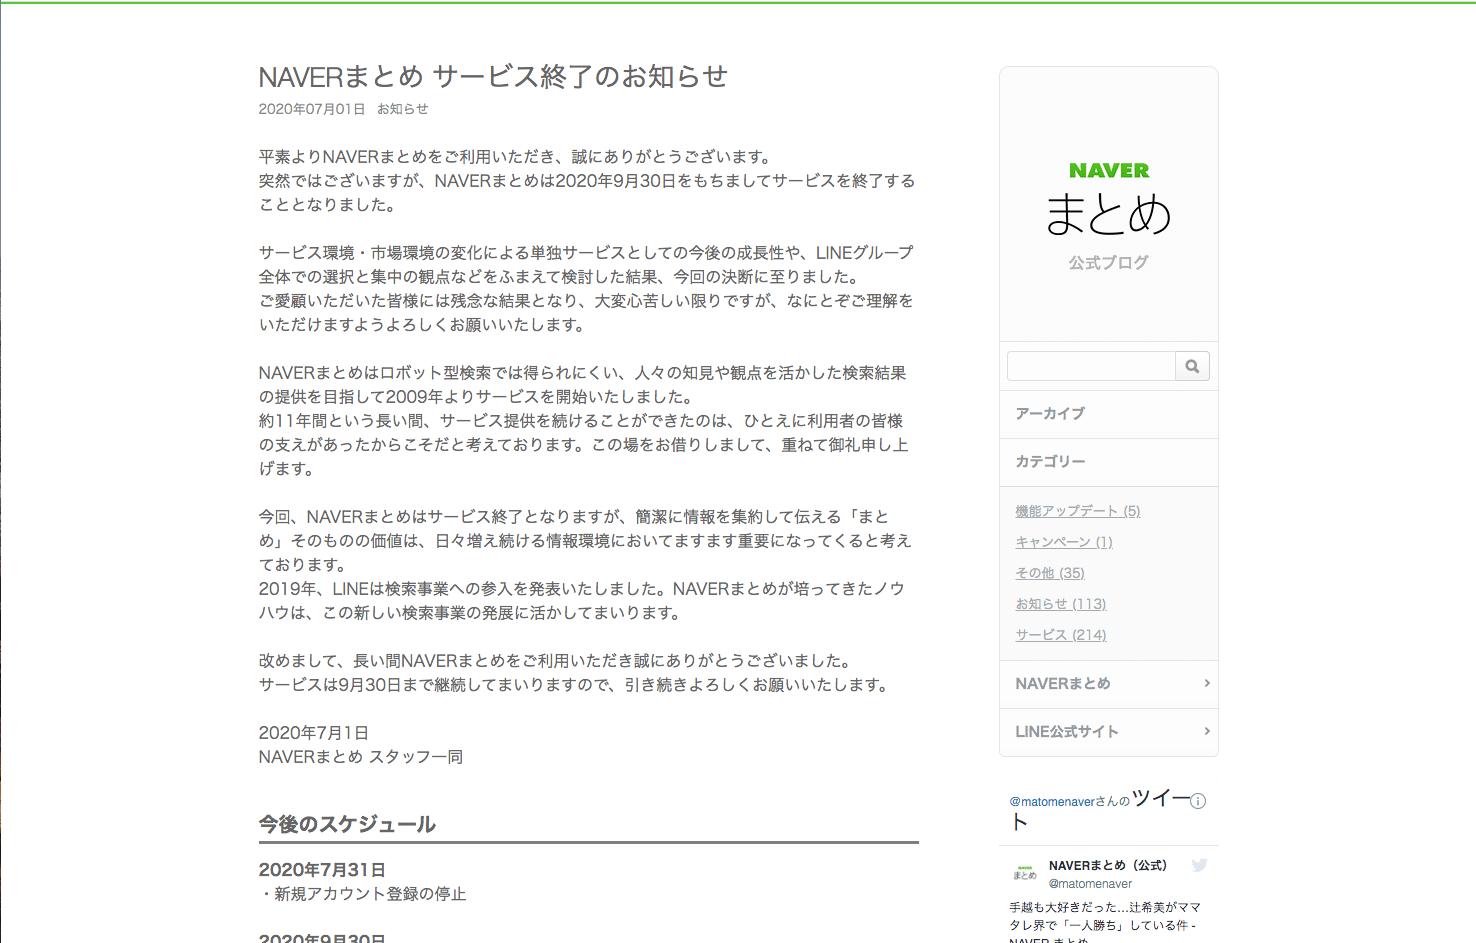 NAVERまとめ サービス終了のお知らせのアイキャッチ